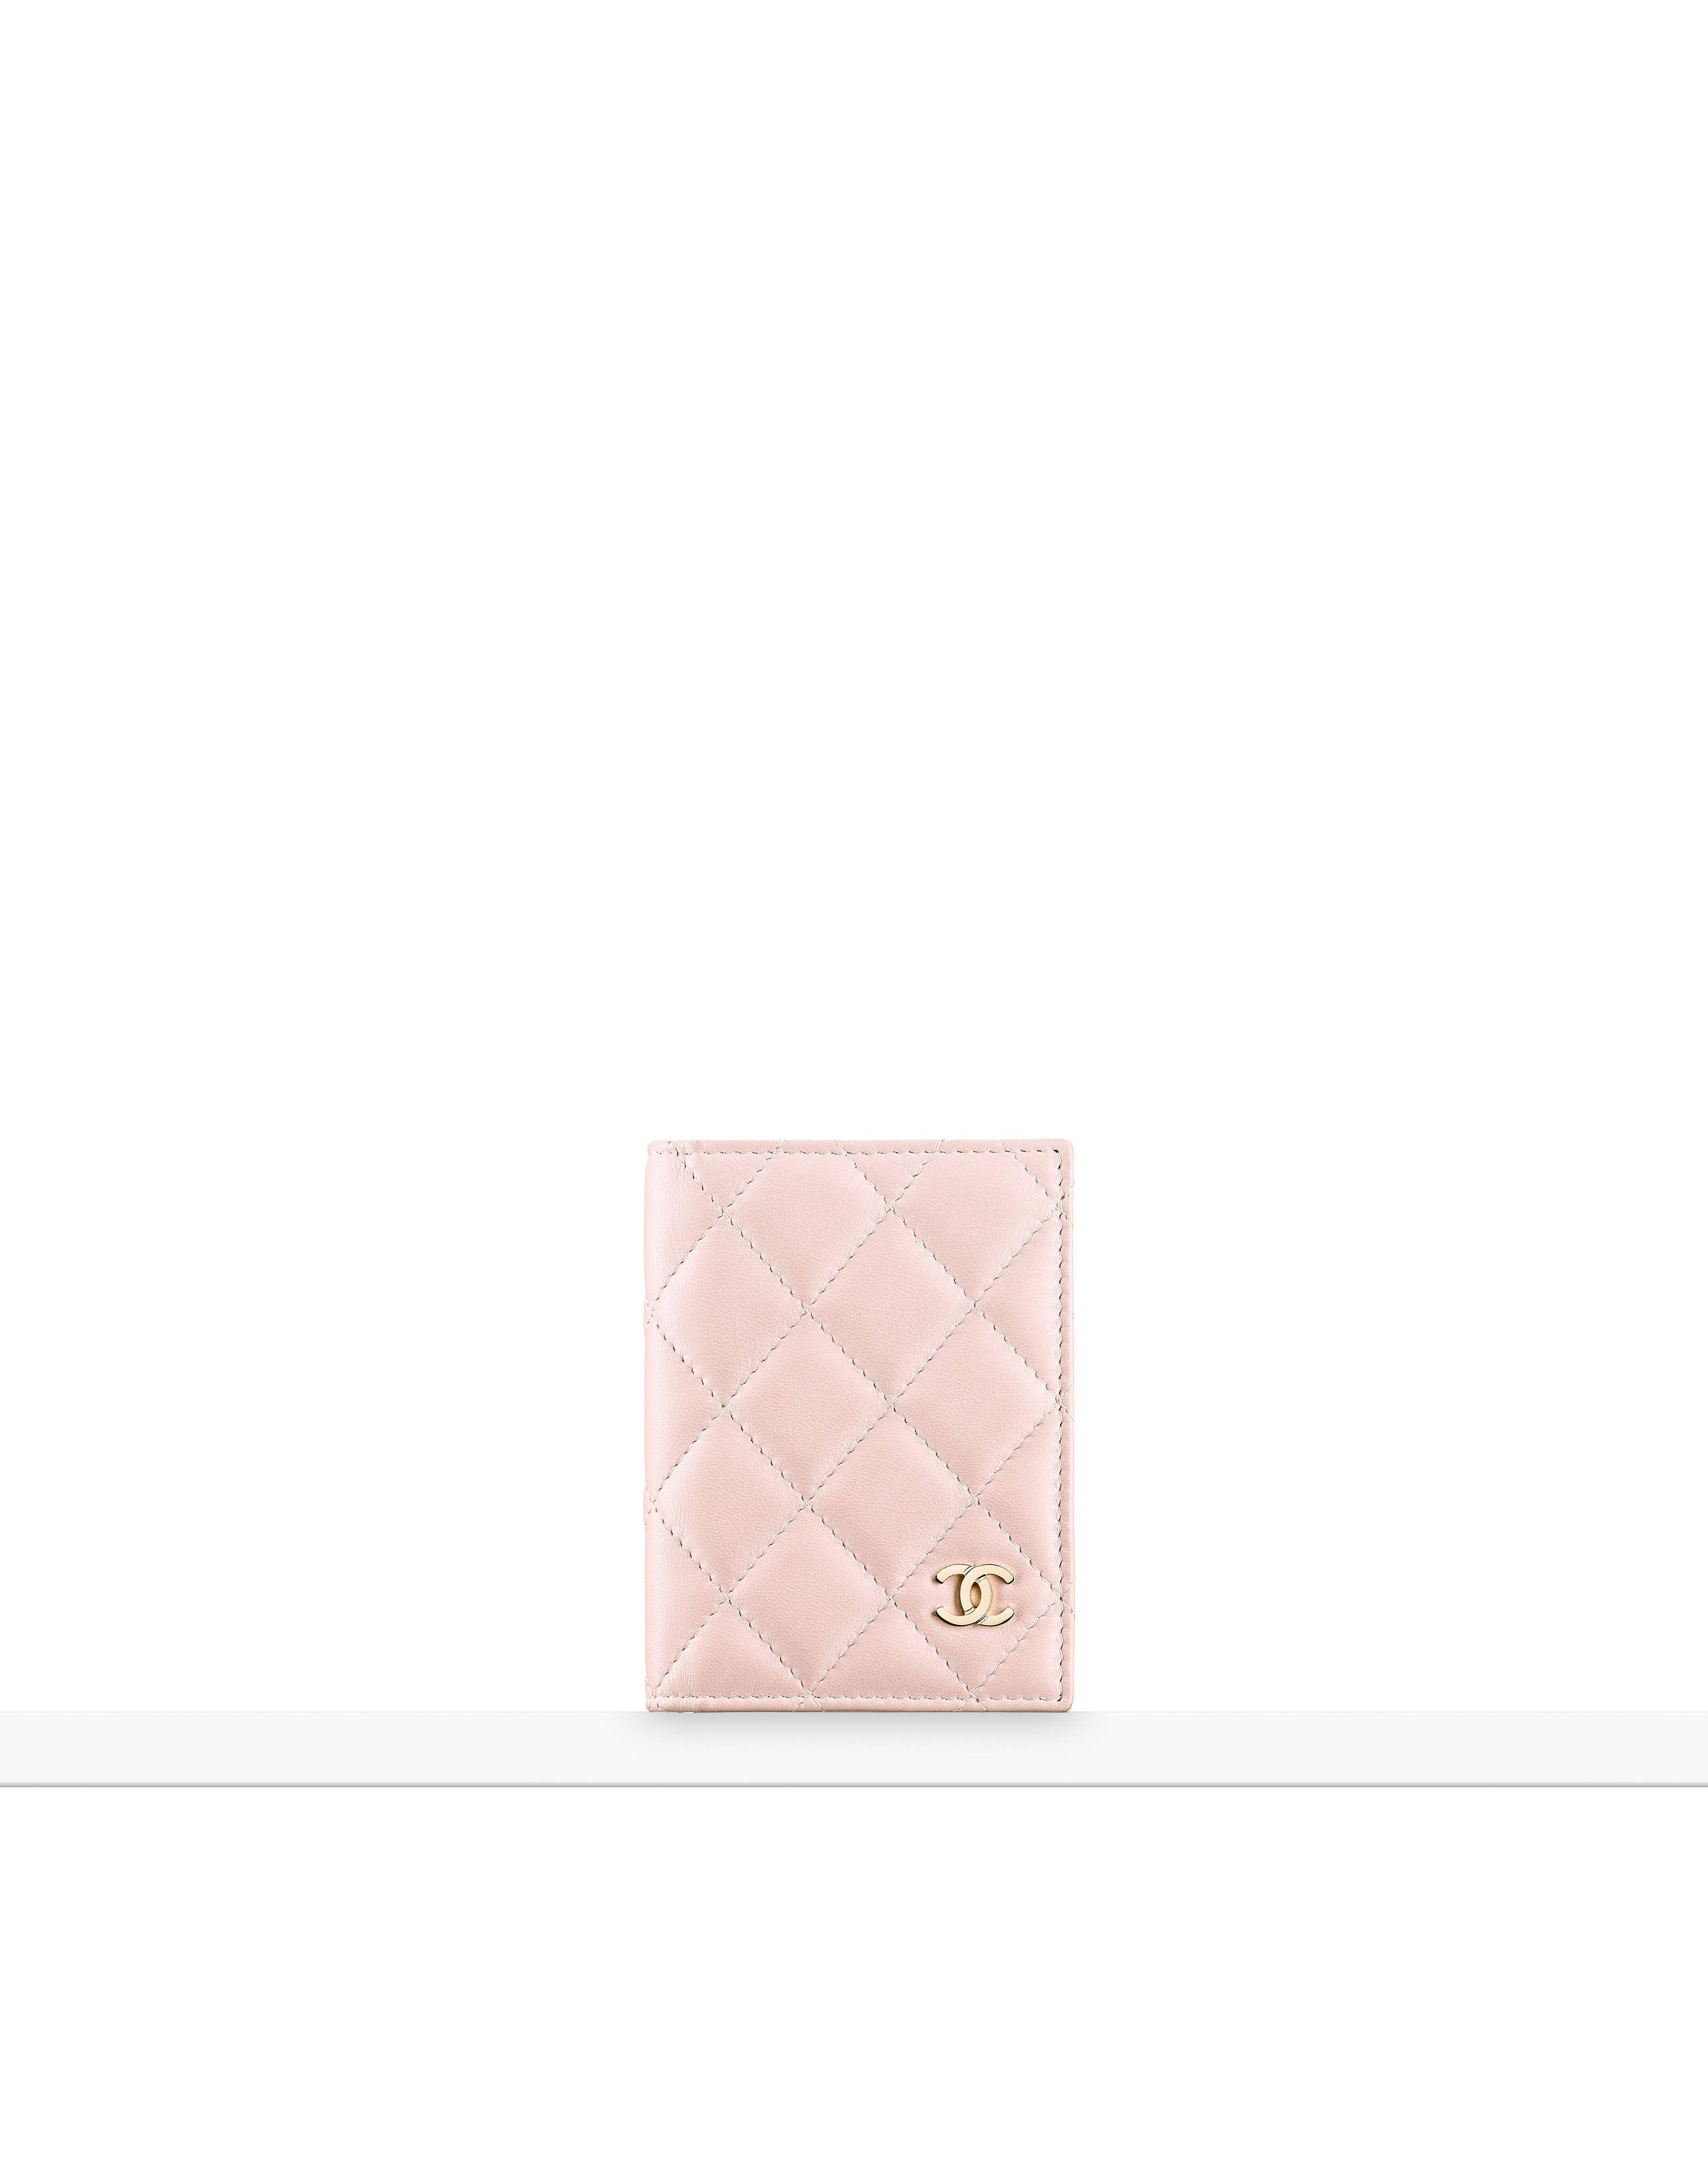 Card holder Cruise 2016 17 lambskin & gold tone metal light pink